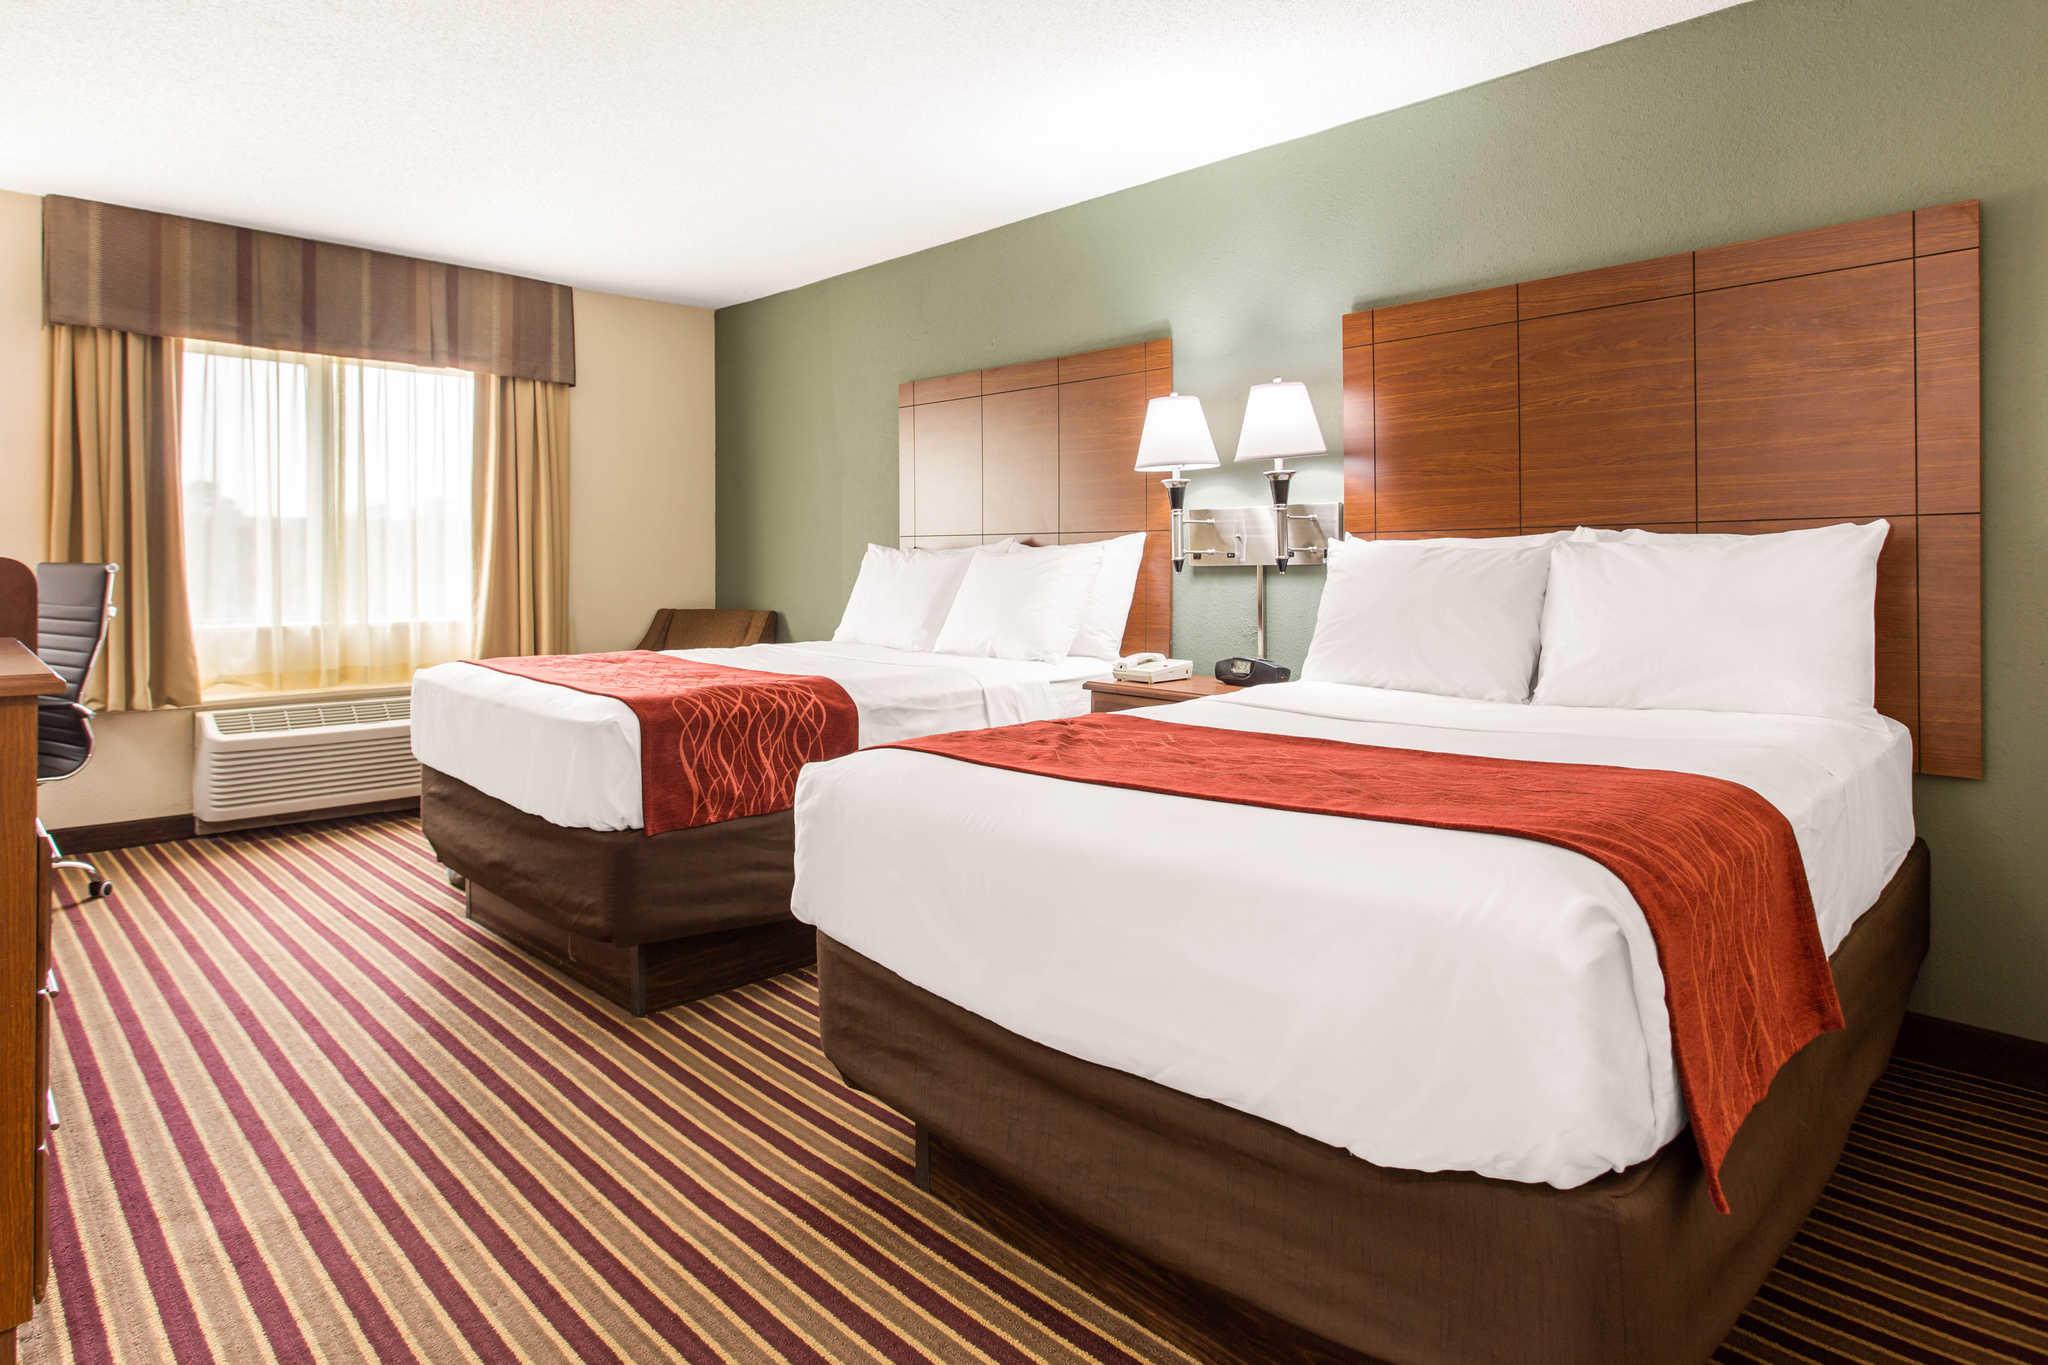 Comfort Inn & Suites Crabtree Valley image 4